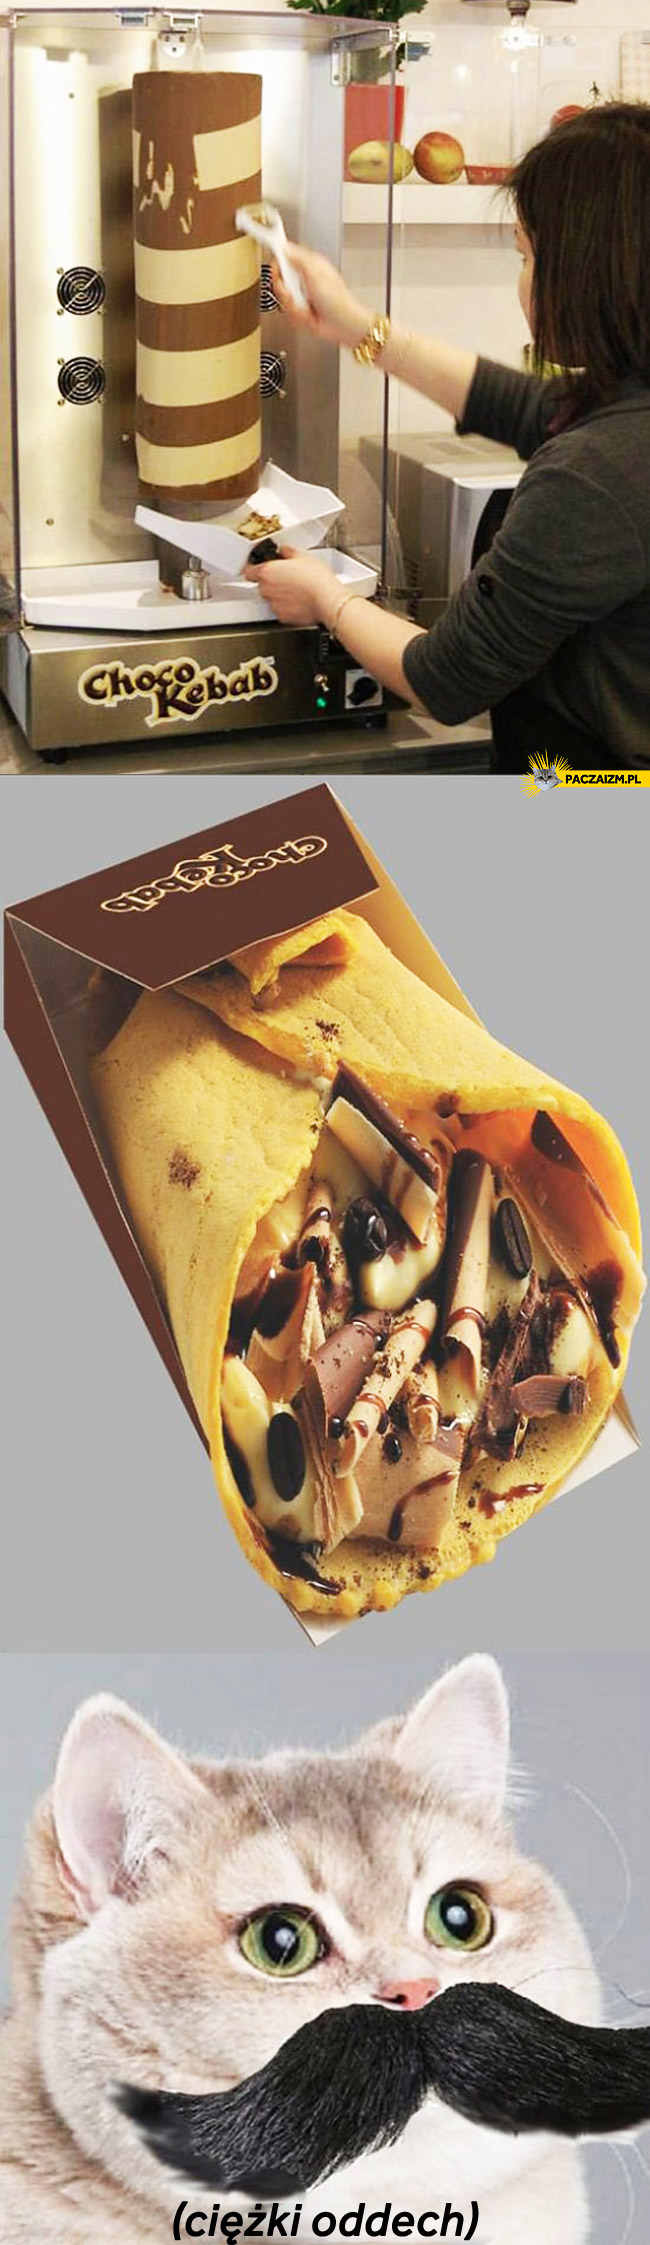 Czekoladowy kebab